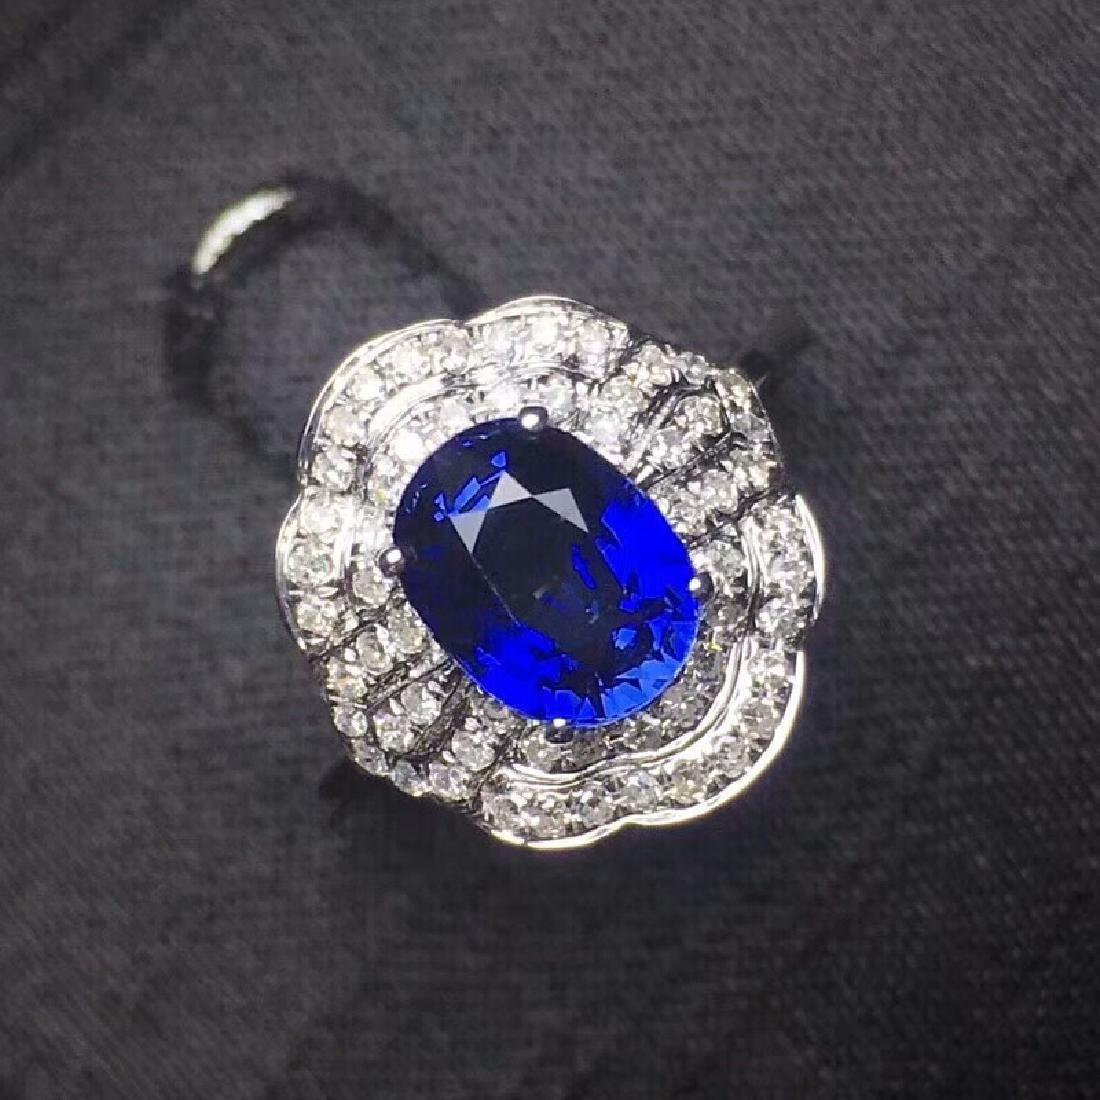 2.14 CTW Sapphire & VS Diamond Ring 18K - 5